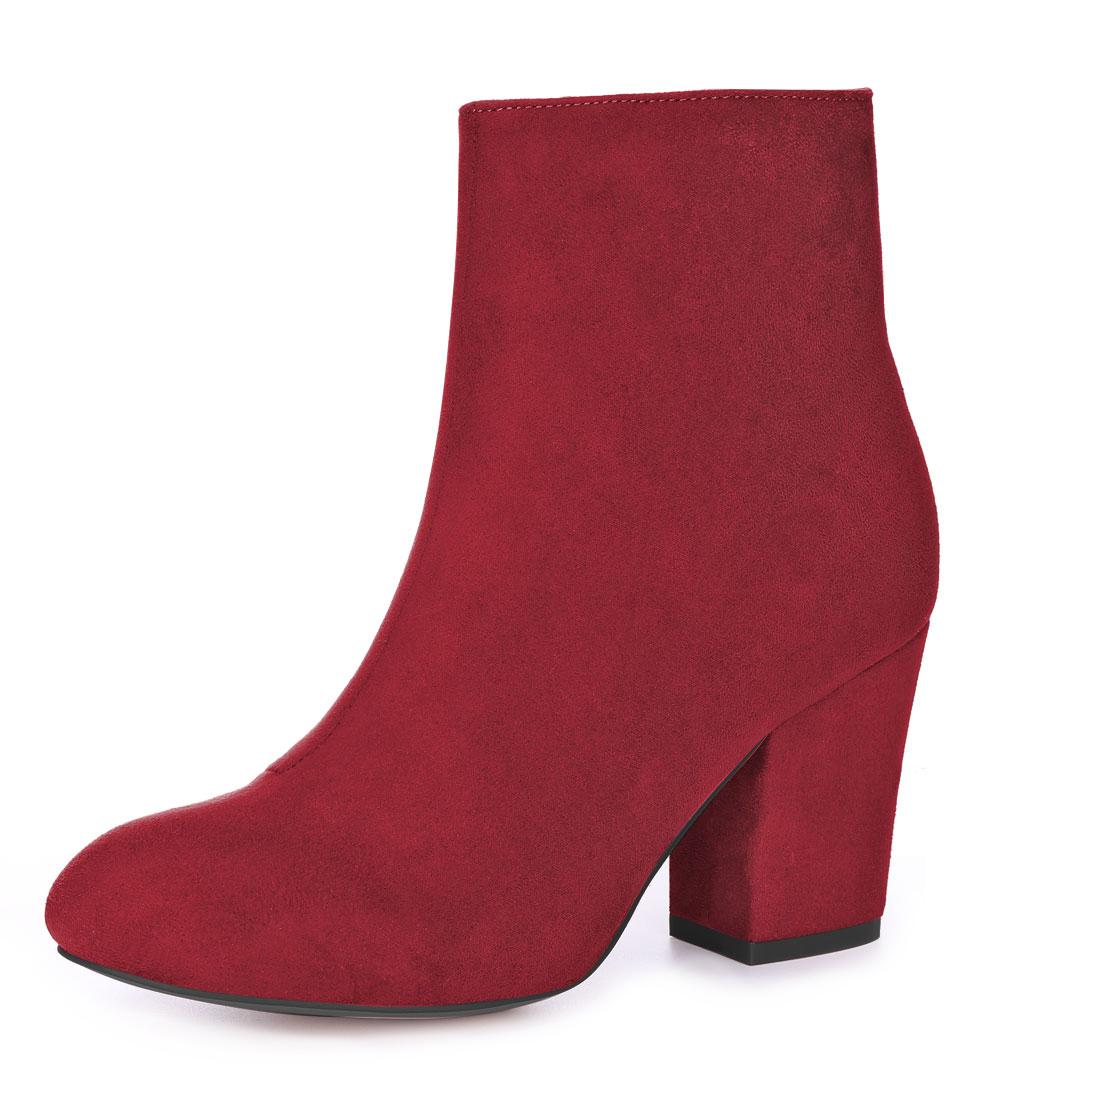 Allegra K Women Round Toe Side Zipper Block Heel Ankle Boots Red US 8